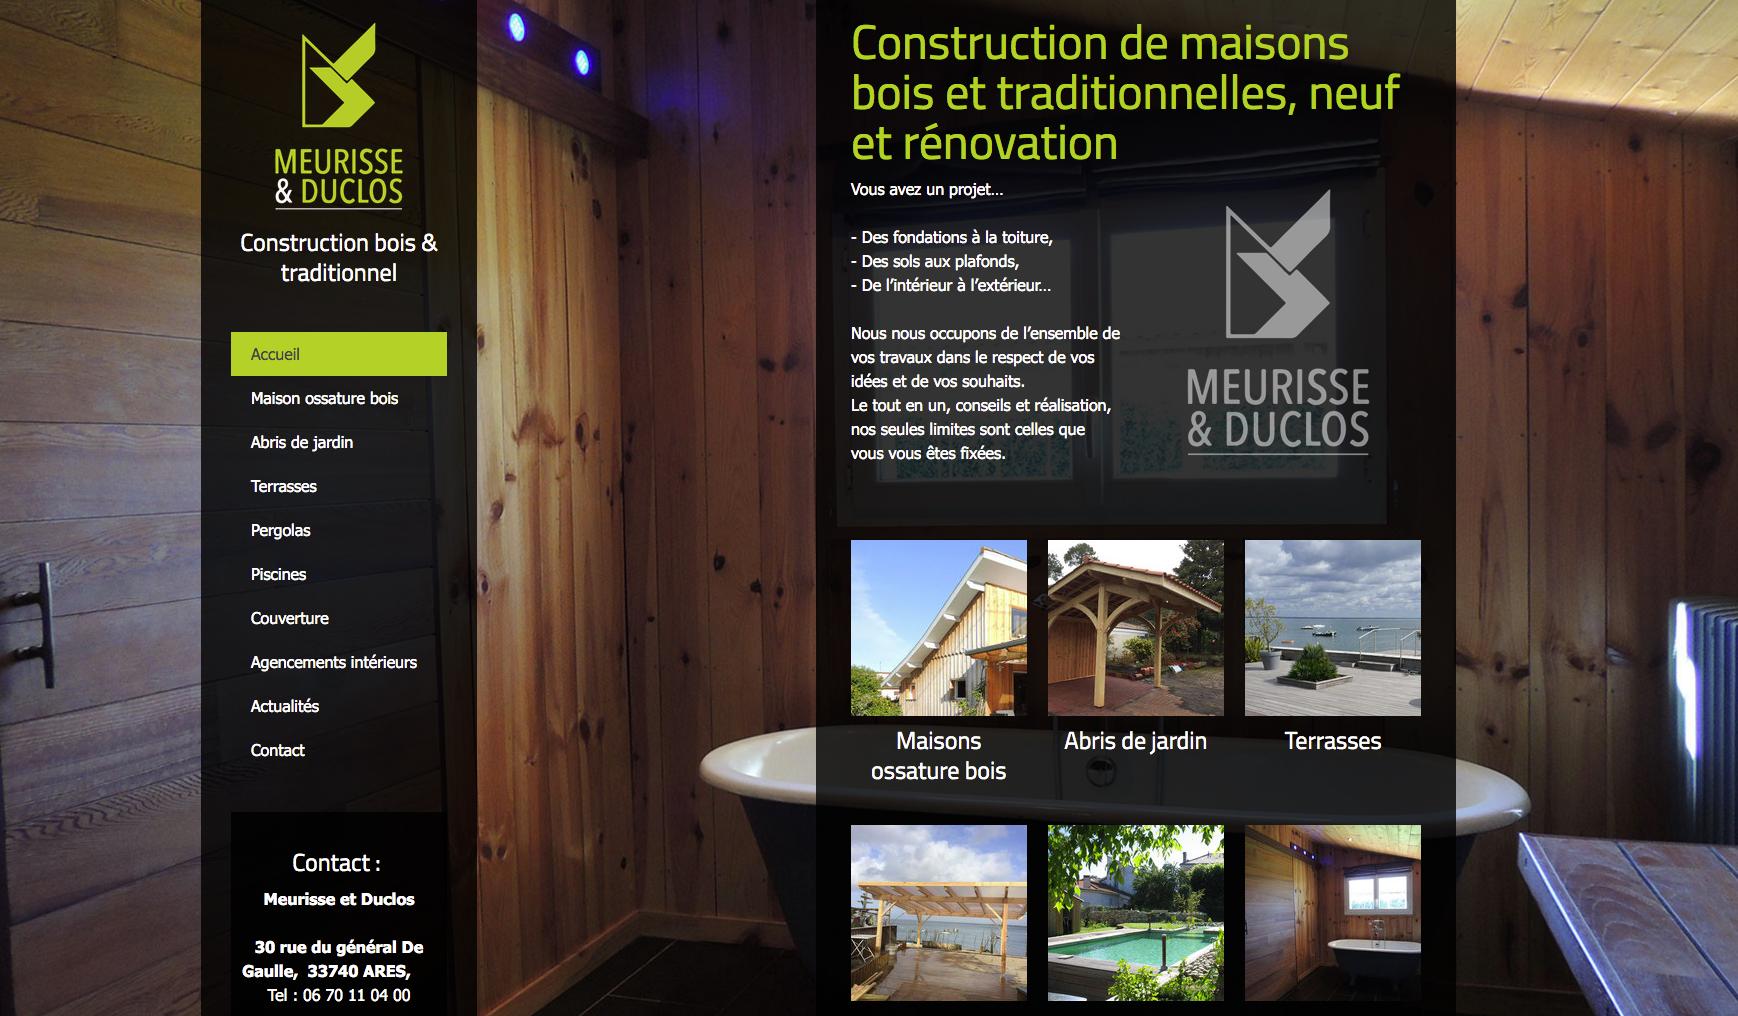 http://www.meurisse-et-duclos.com